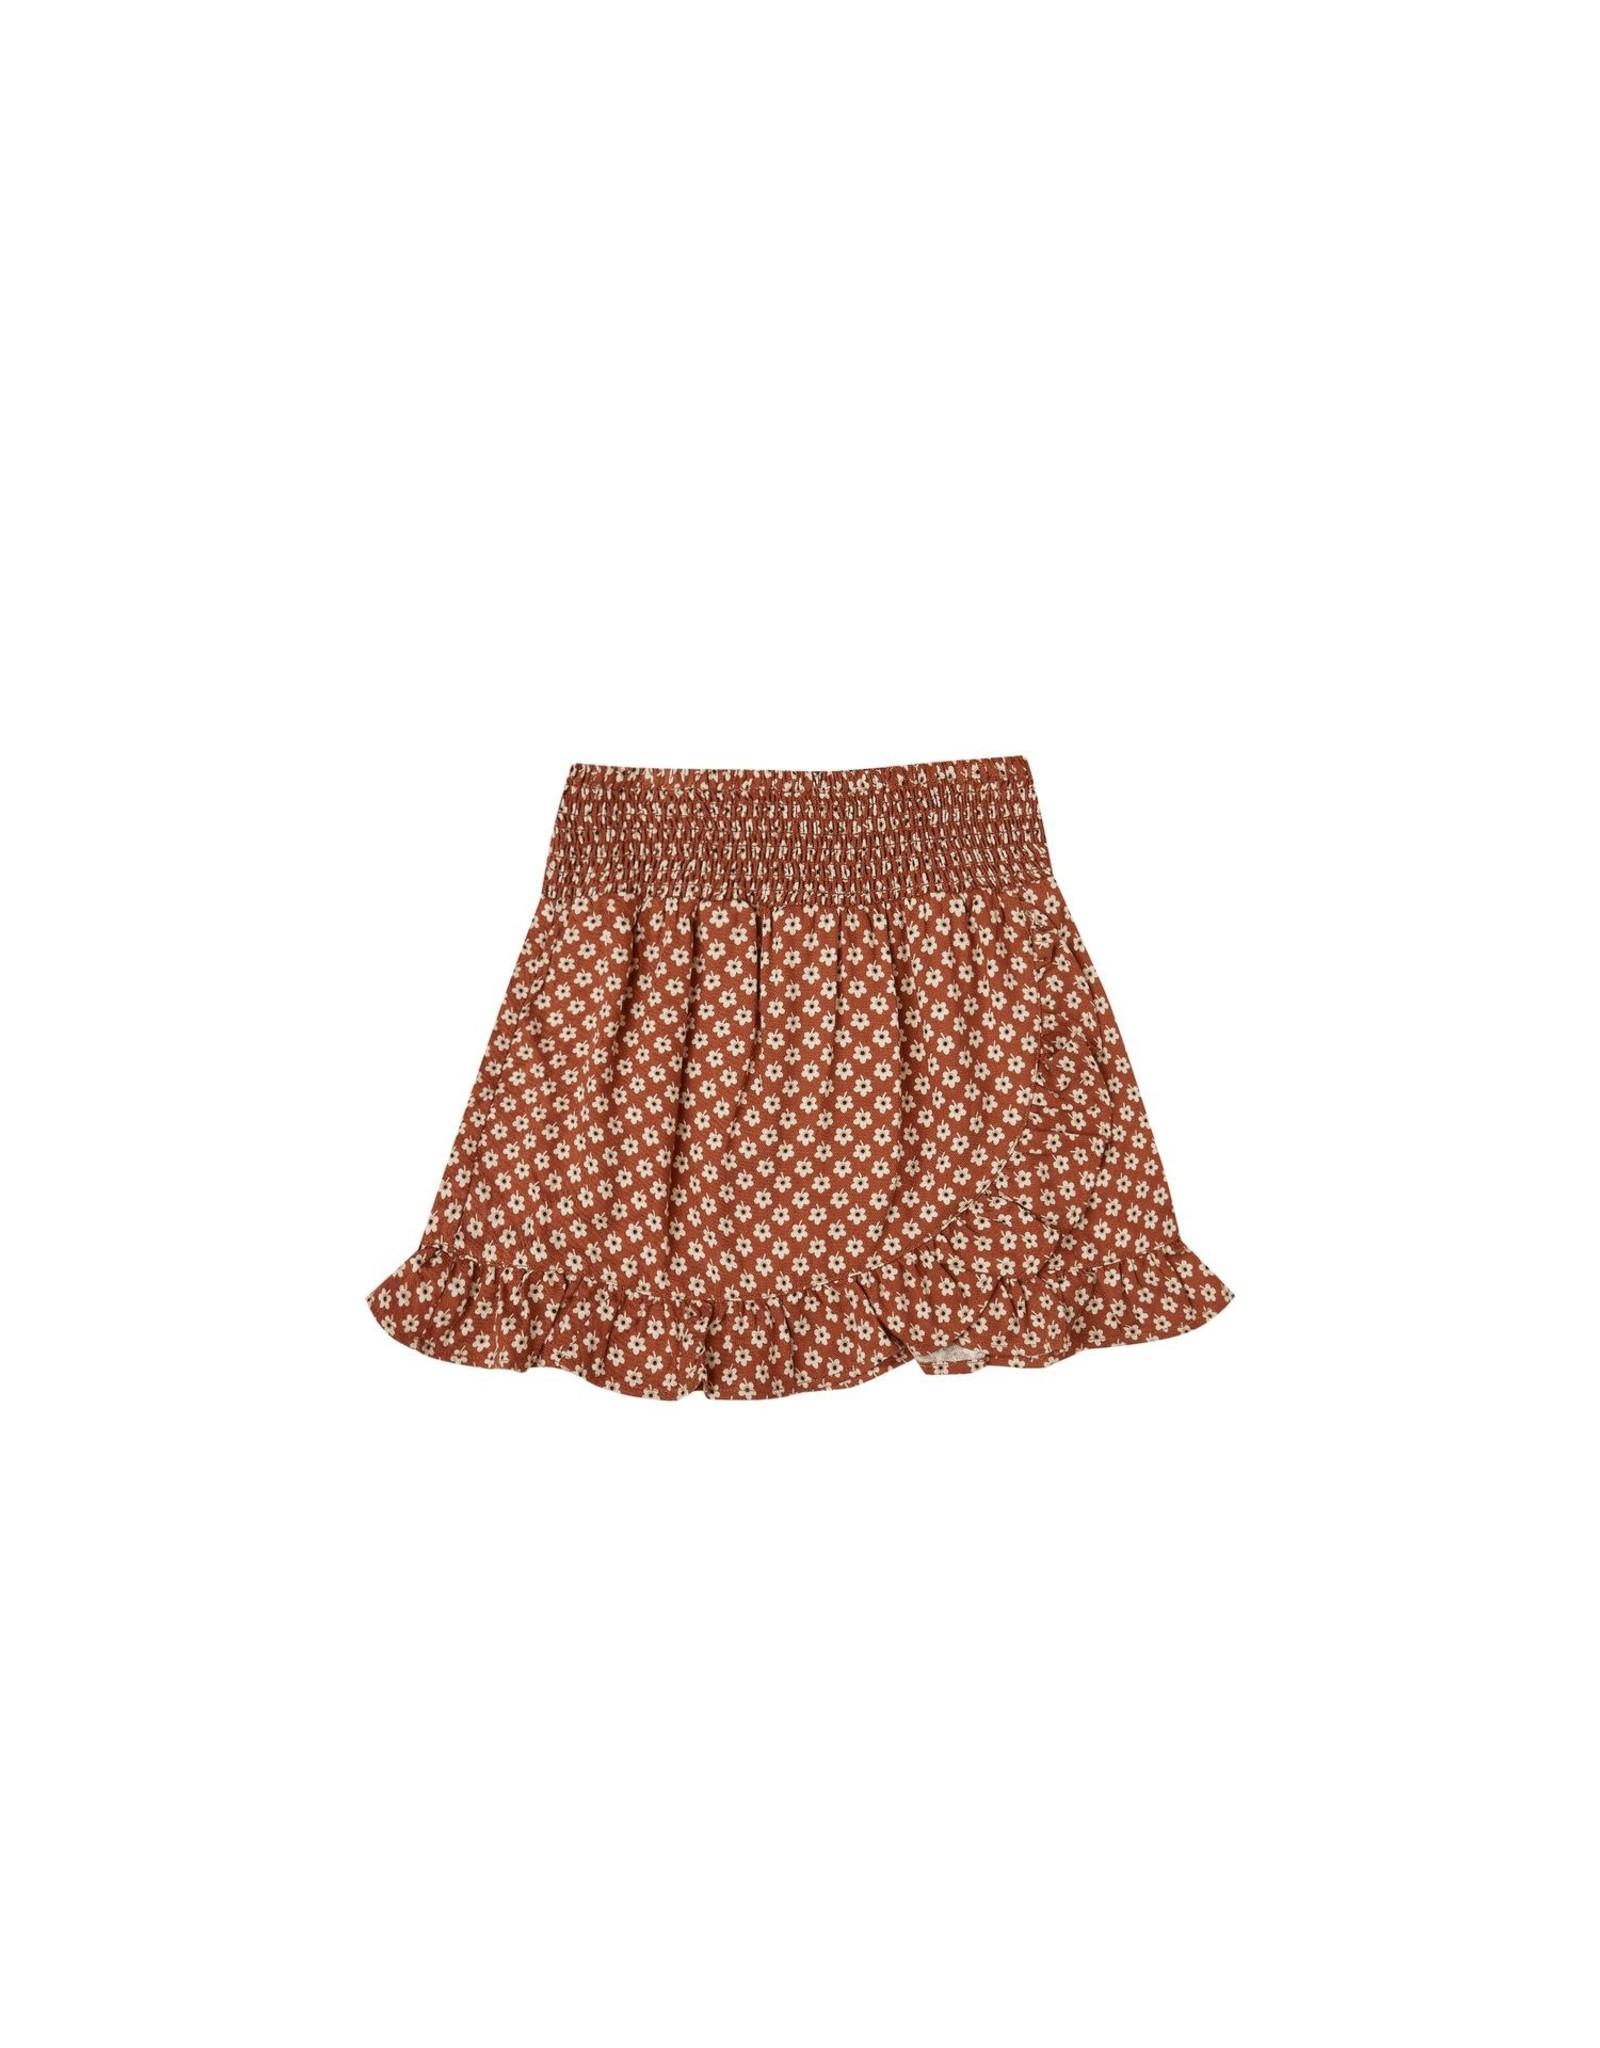 Rylee and Cru flower power wrap skirt